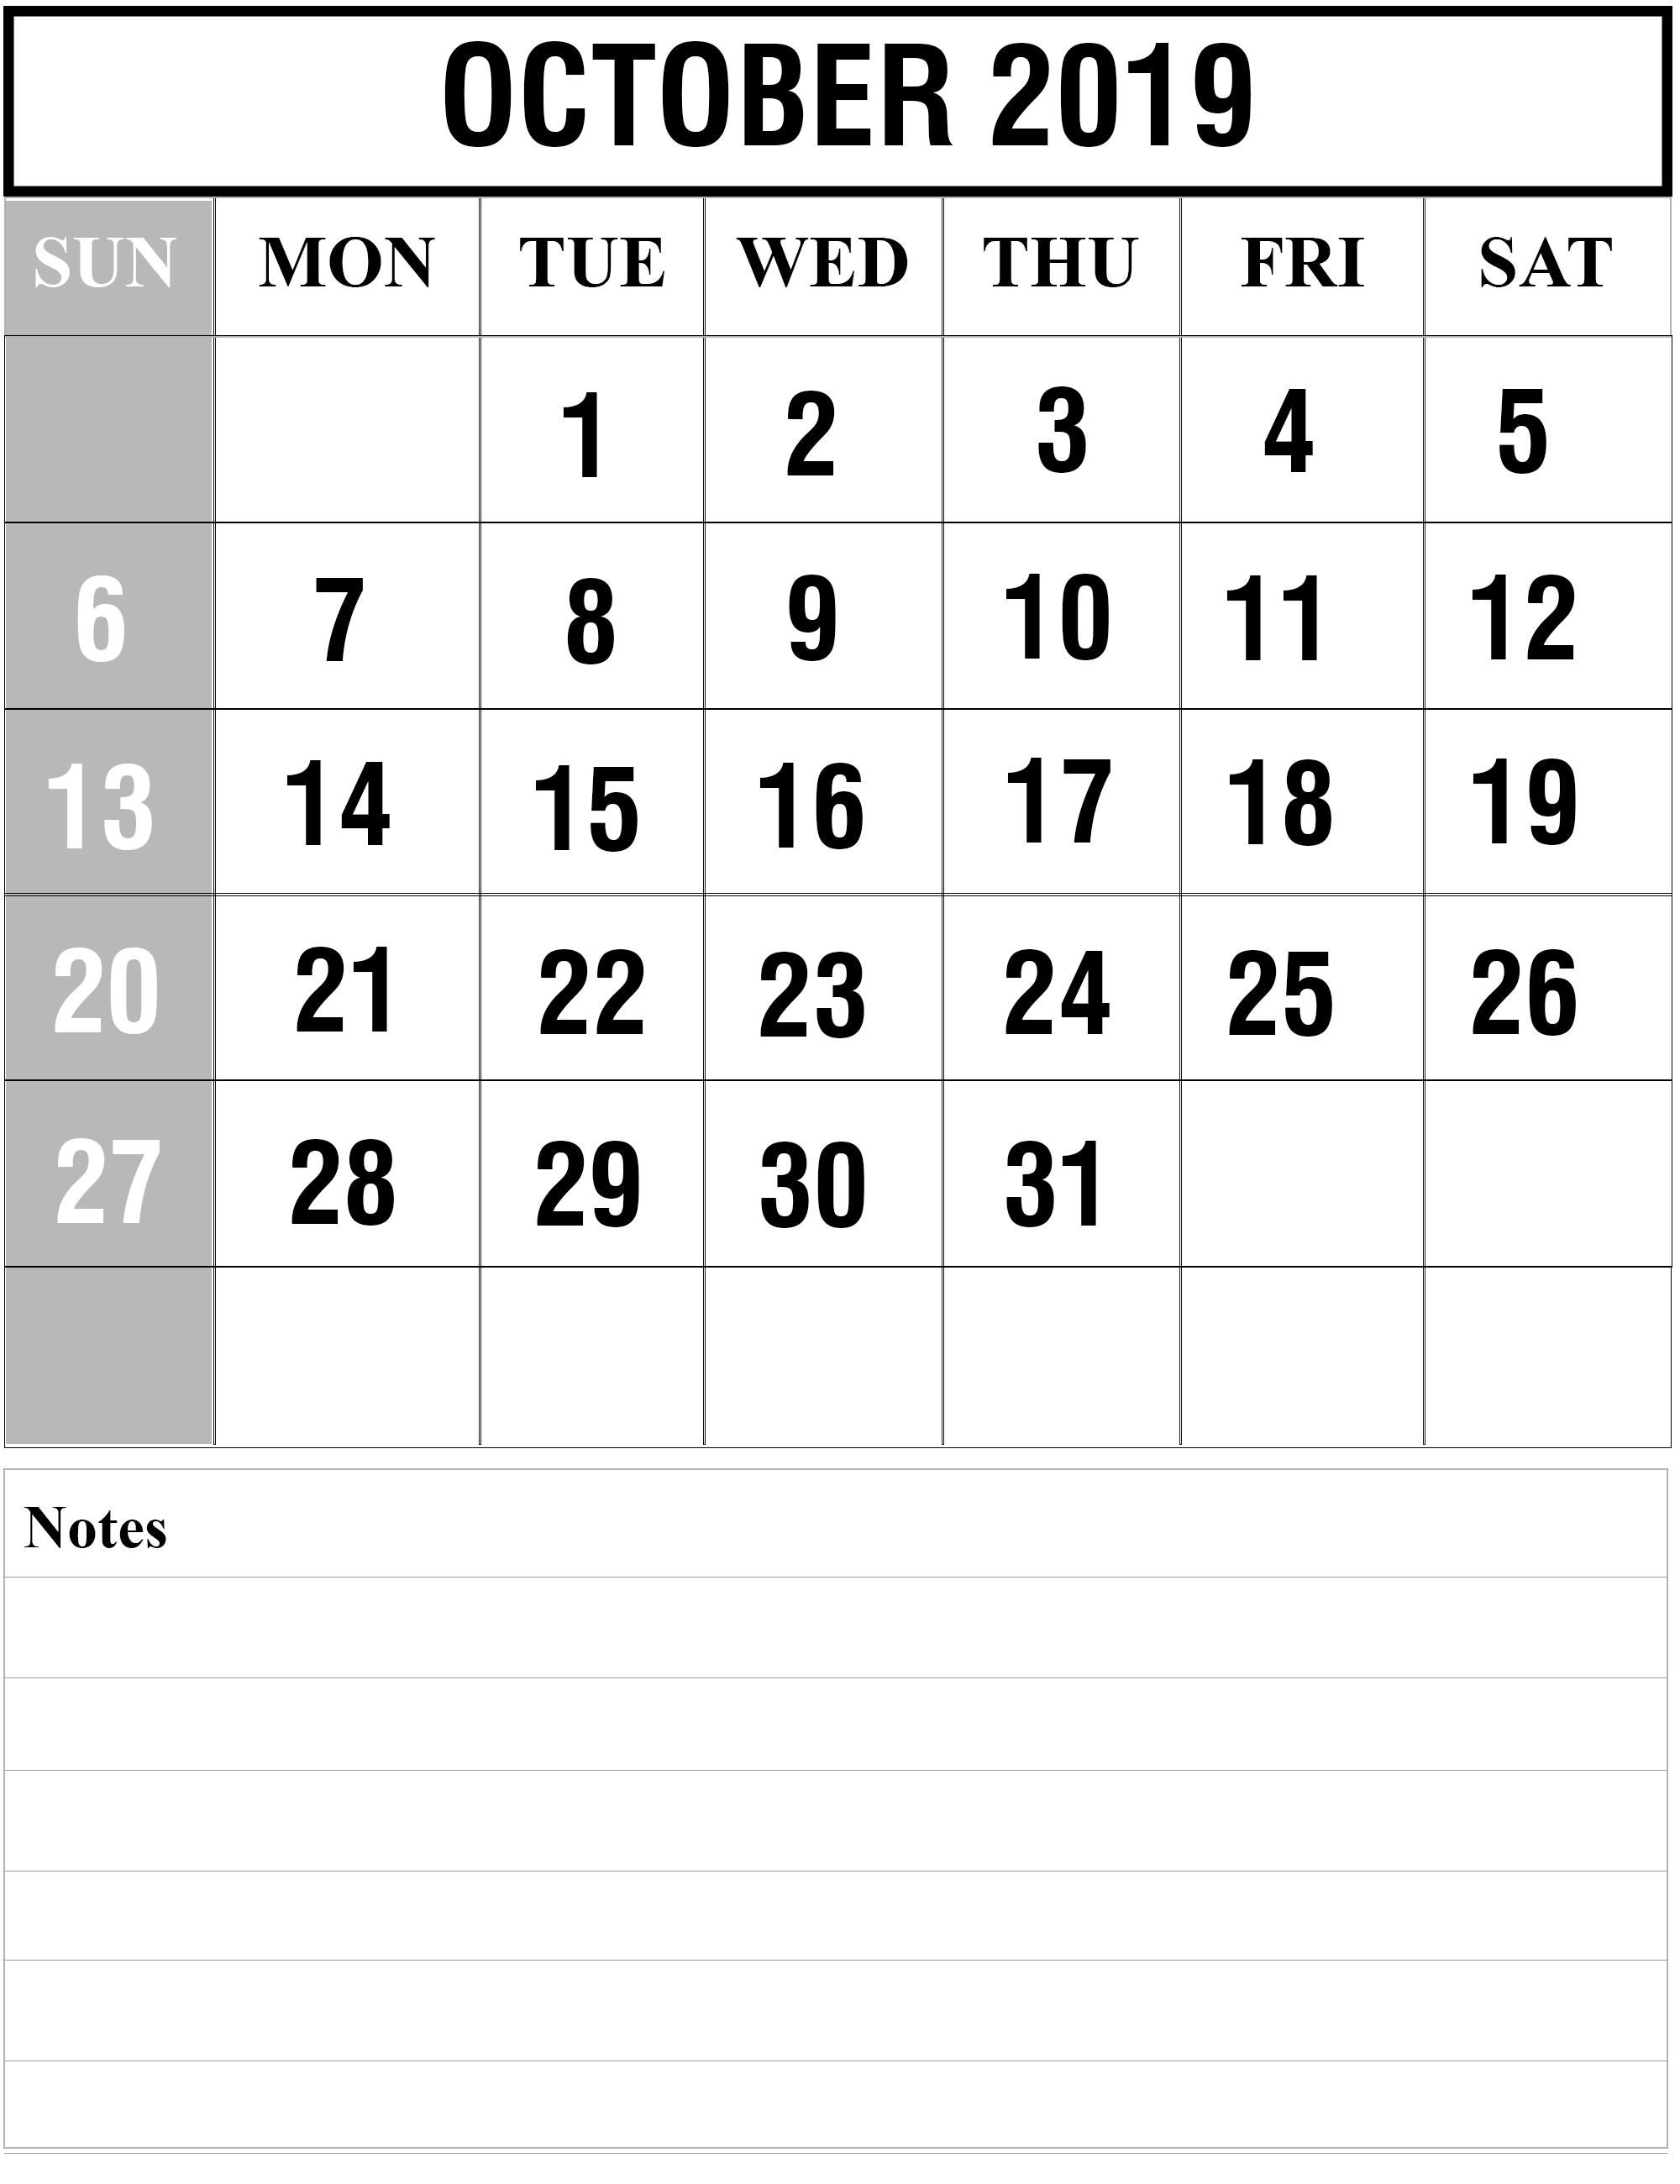 Free October 2019 Printable Calendar Blank Templates-Calendar Template 2020 Printable Free With Prior And Next Month